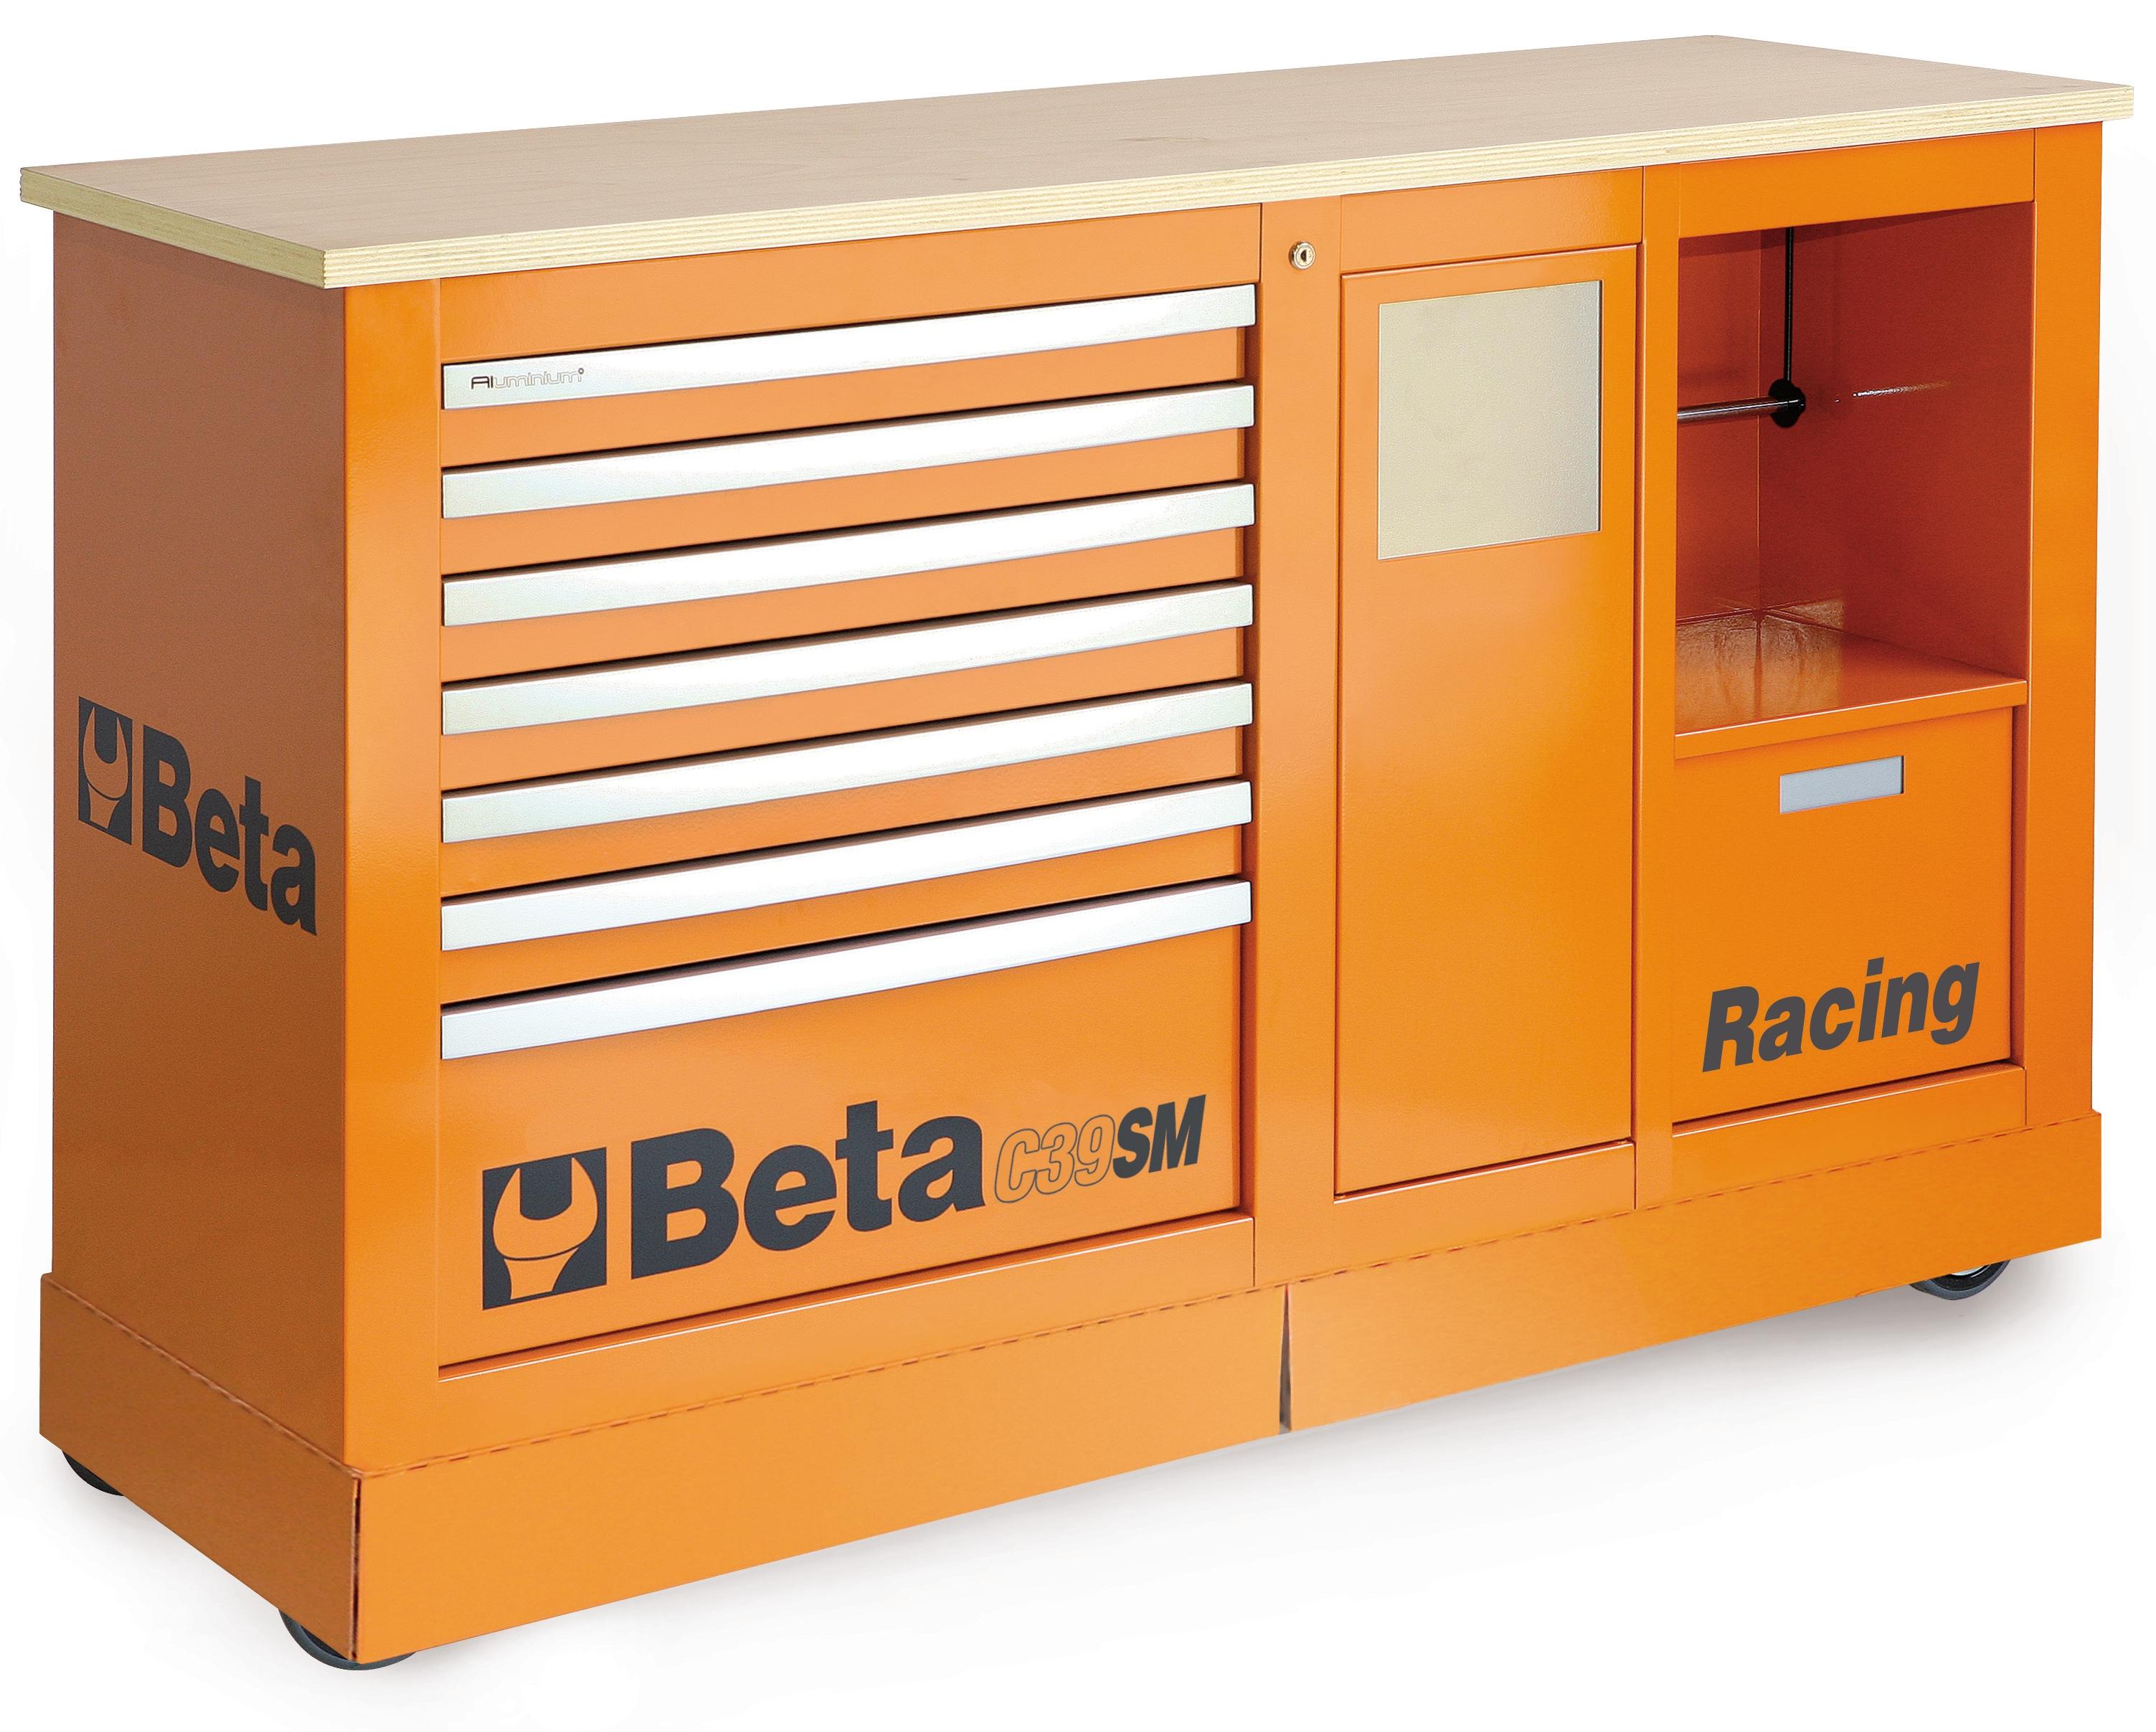 Cassettiere C39SM - BETA Utensili